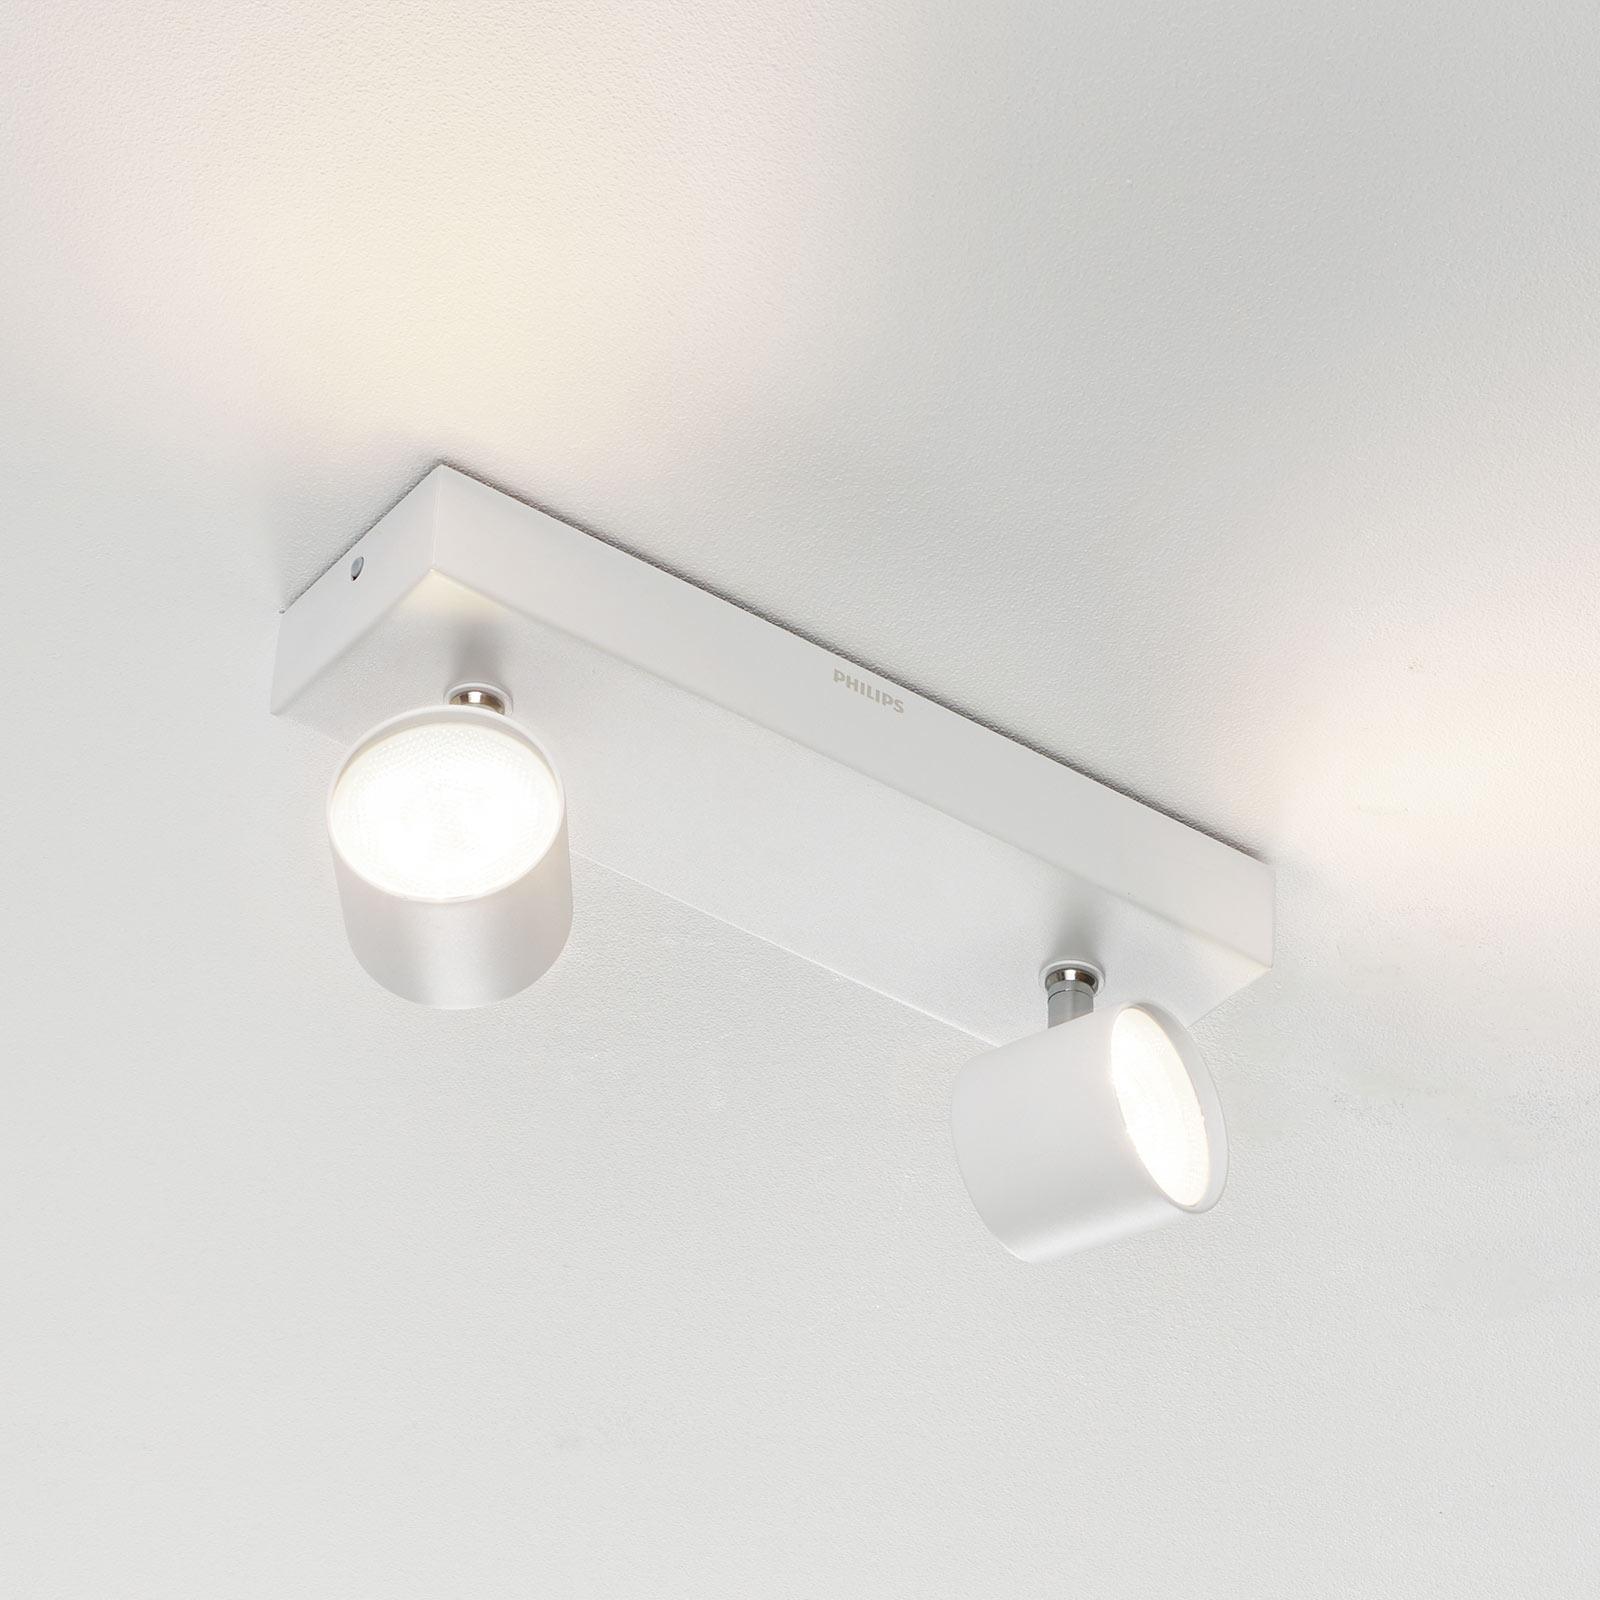 Star - 2 lyskilder LED spot, warmglow, hvit